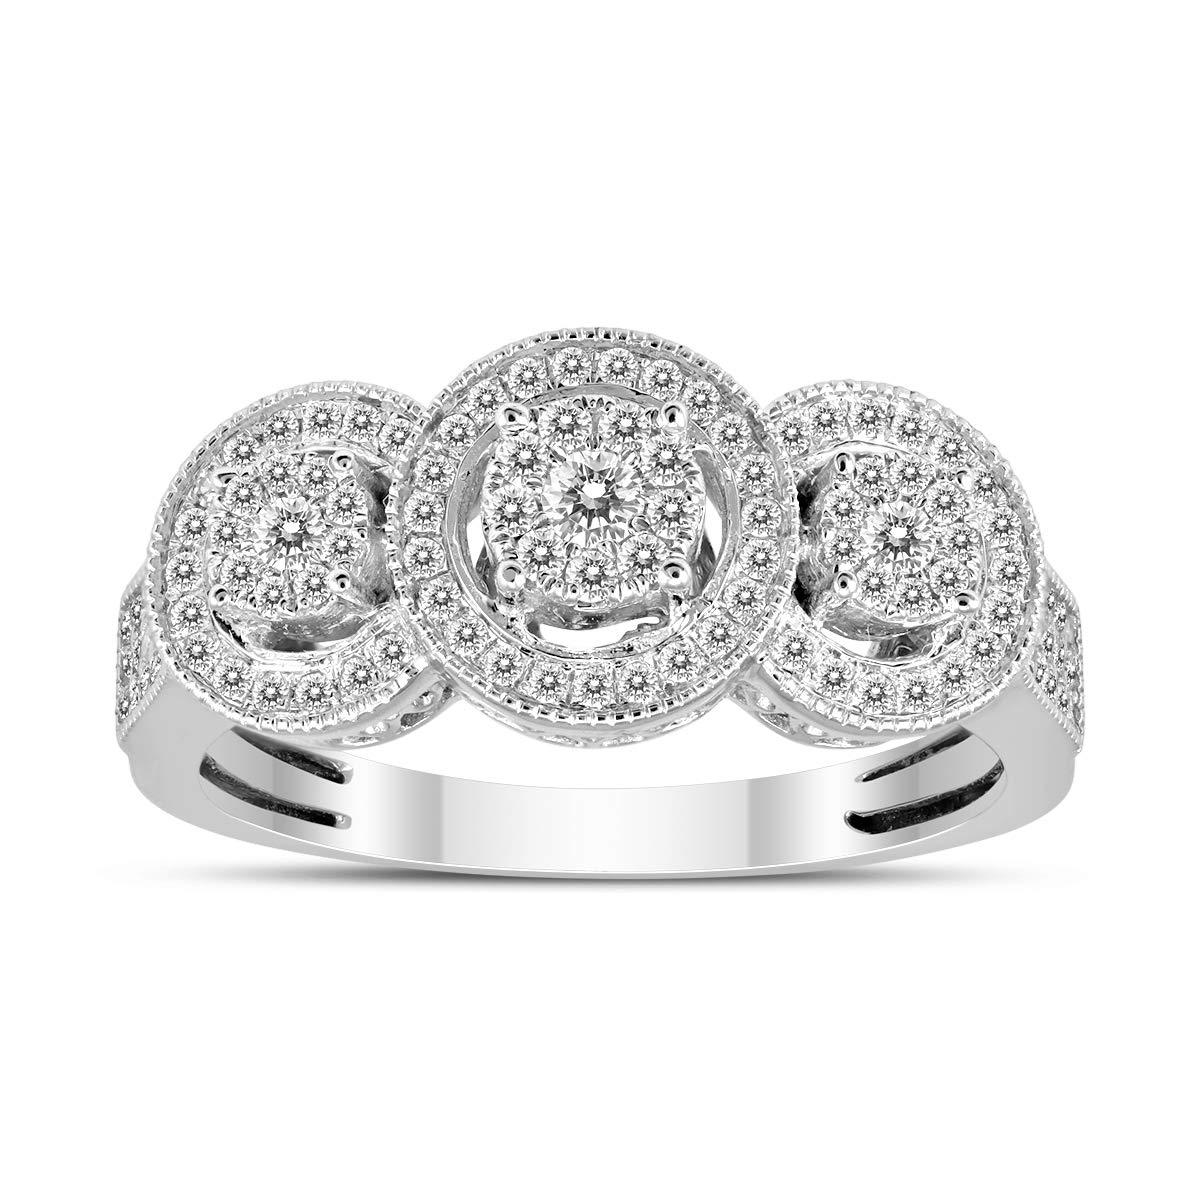 1/2 Carat TW Three Stone Halo Cluster Diamond Ring in 14K White Gold by Szul (Image #1)